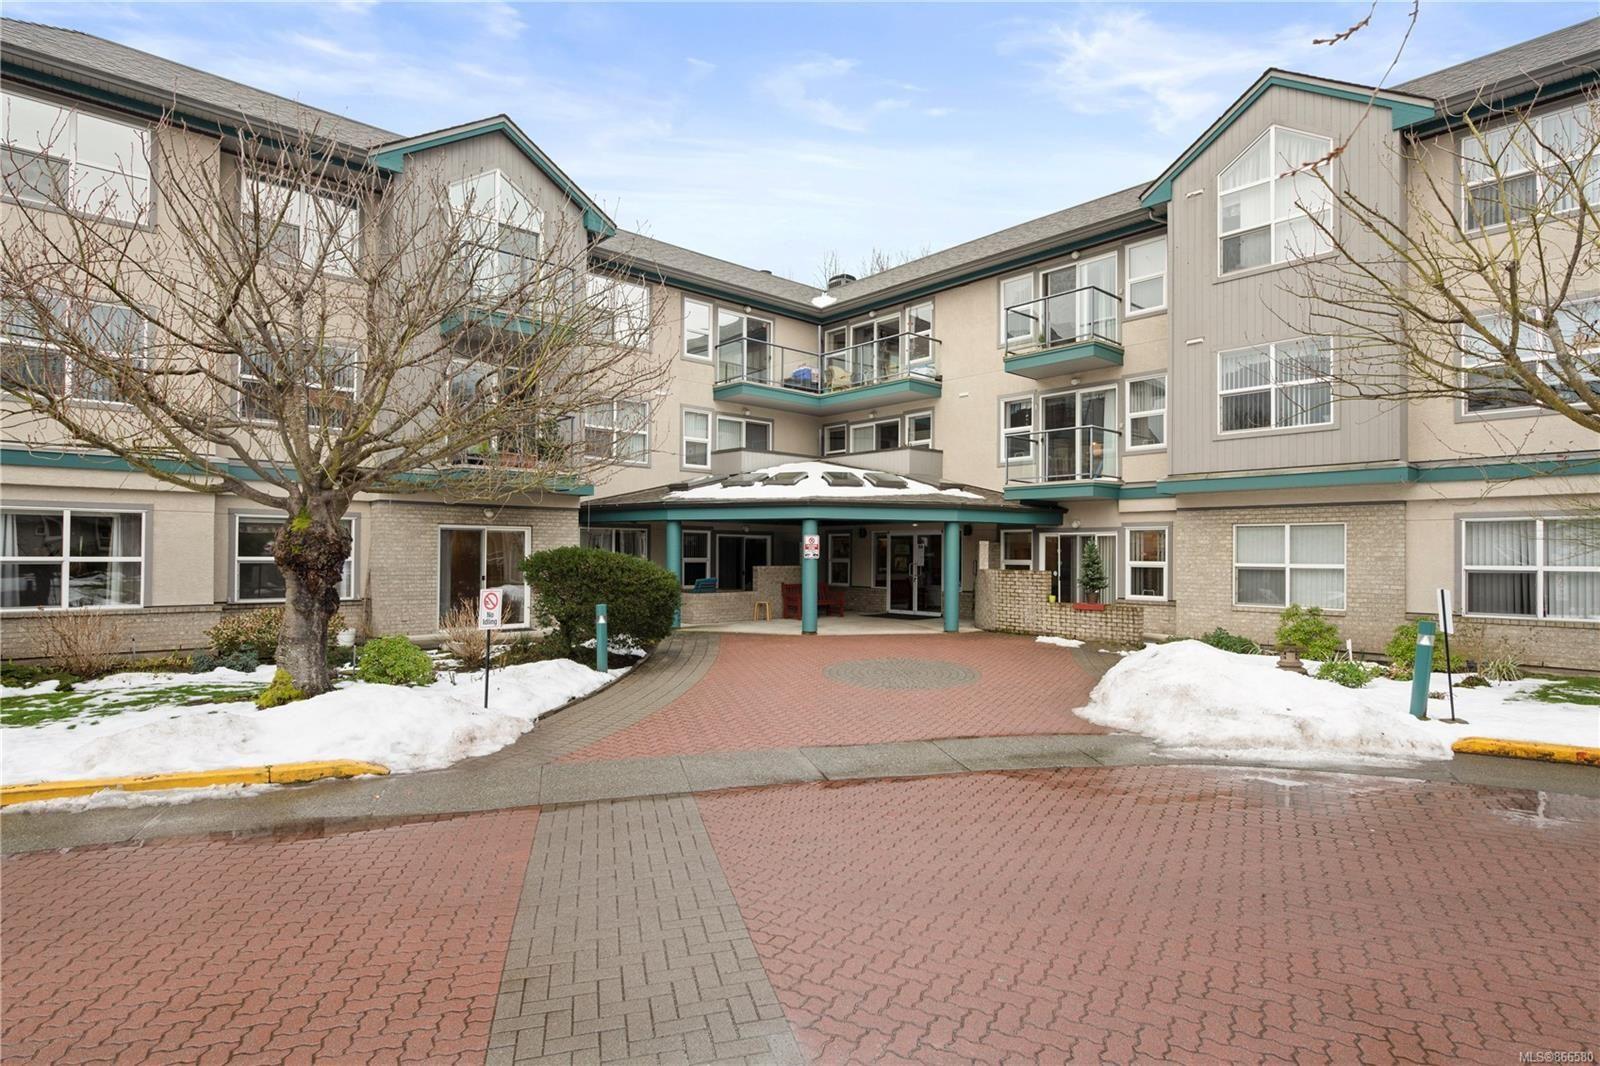 Main Photo: 102 1485 Garnet Rd in : SE Cedar Hill Condo for sale (Saanich East)  : MLS®# 866580